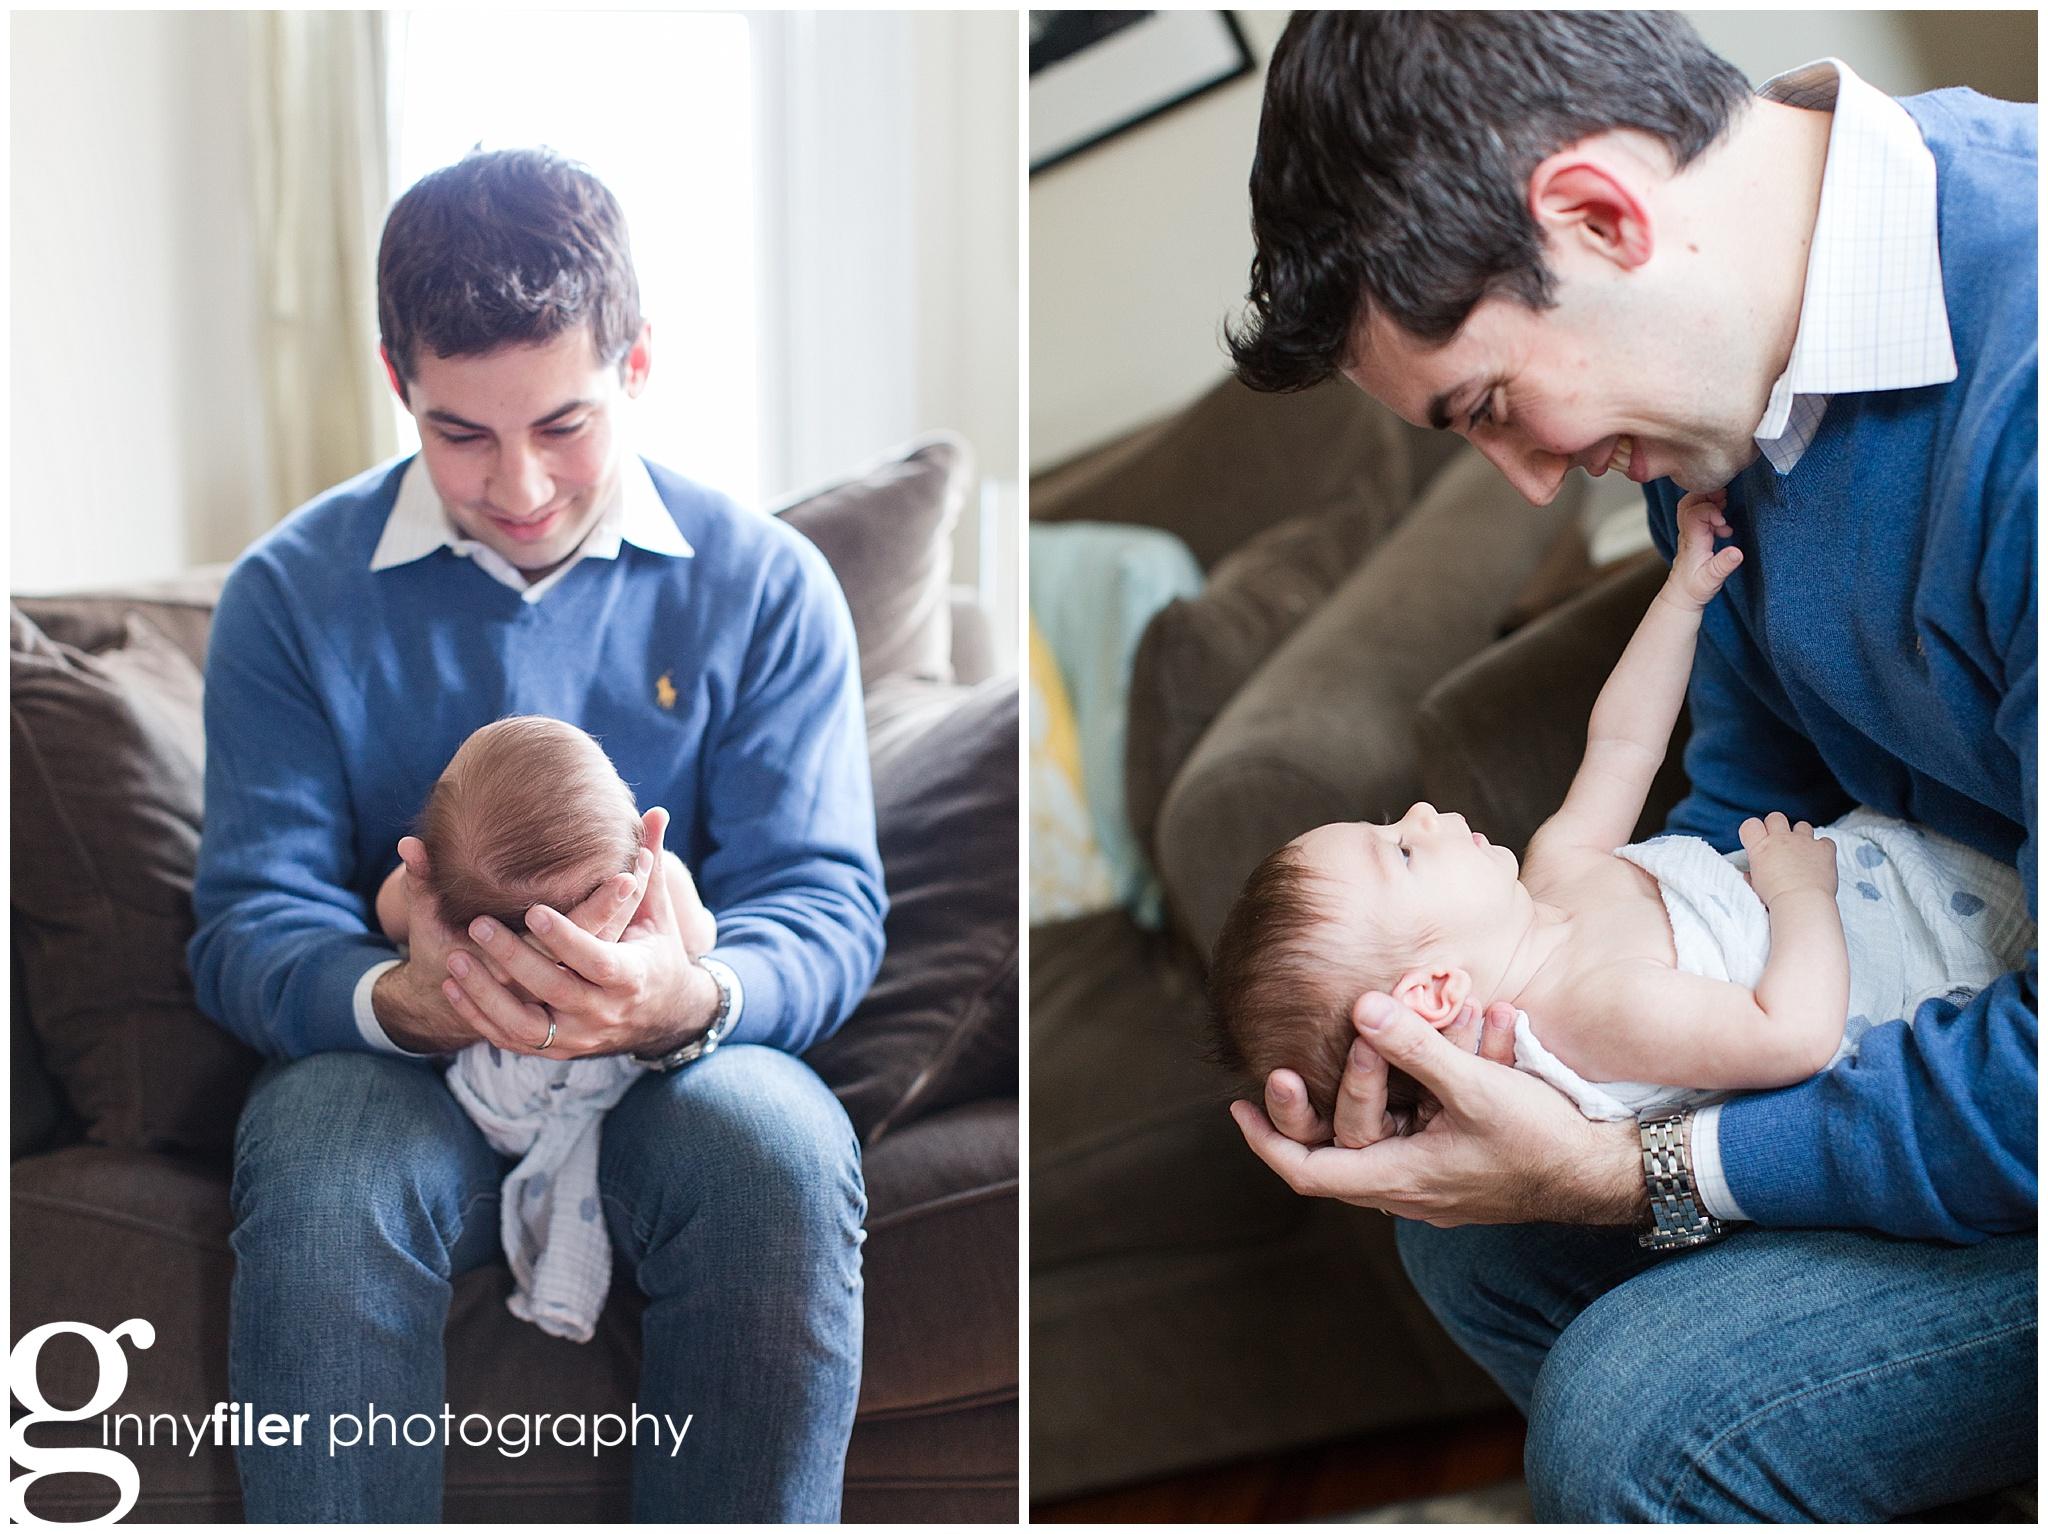 newborn_photography_Cullen_0003.jpg